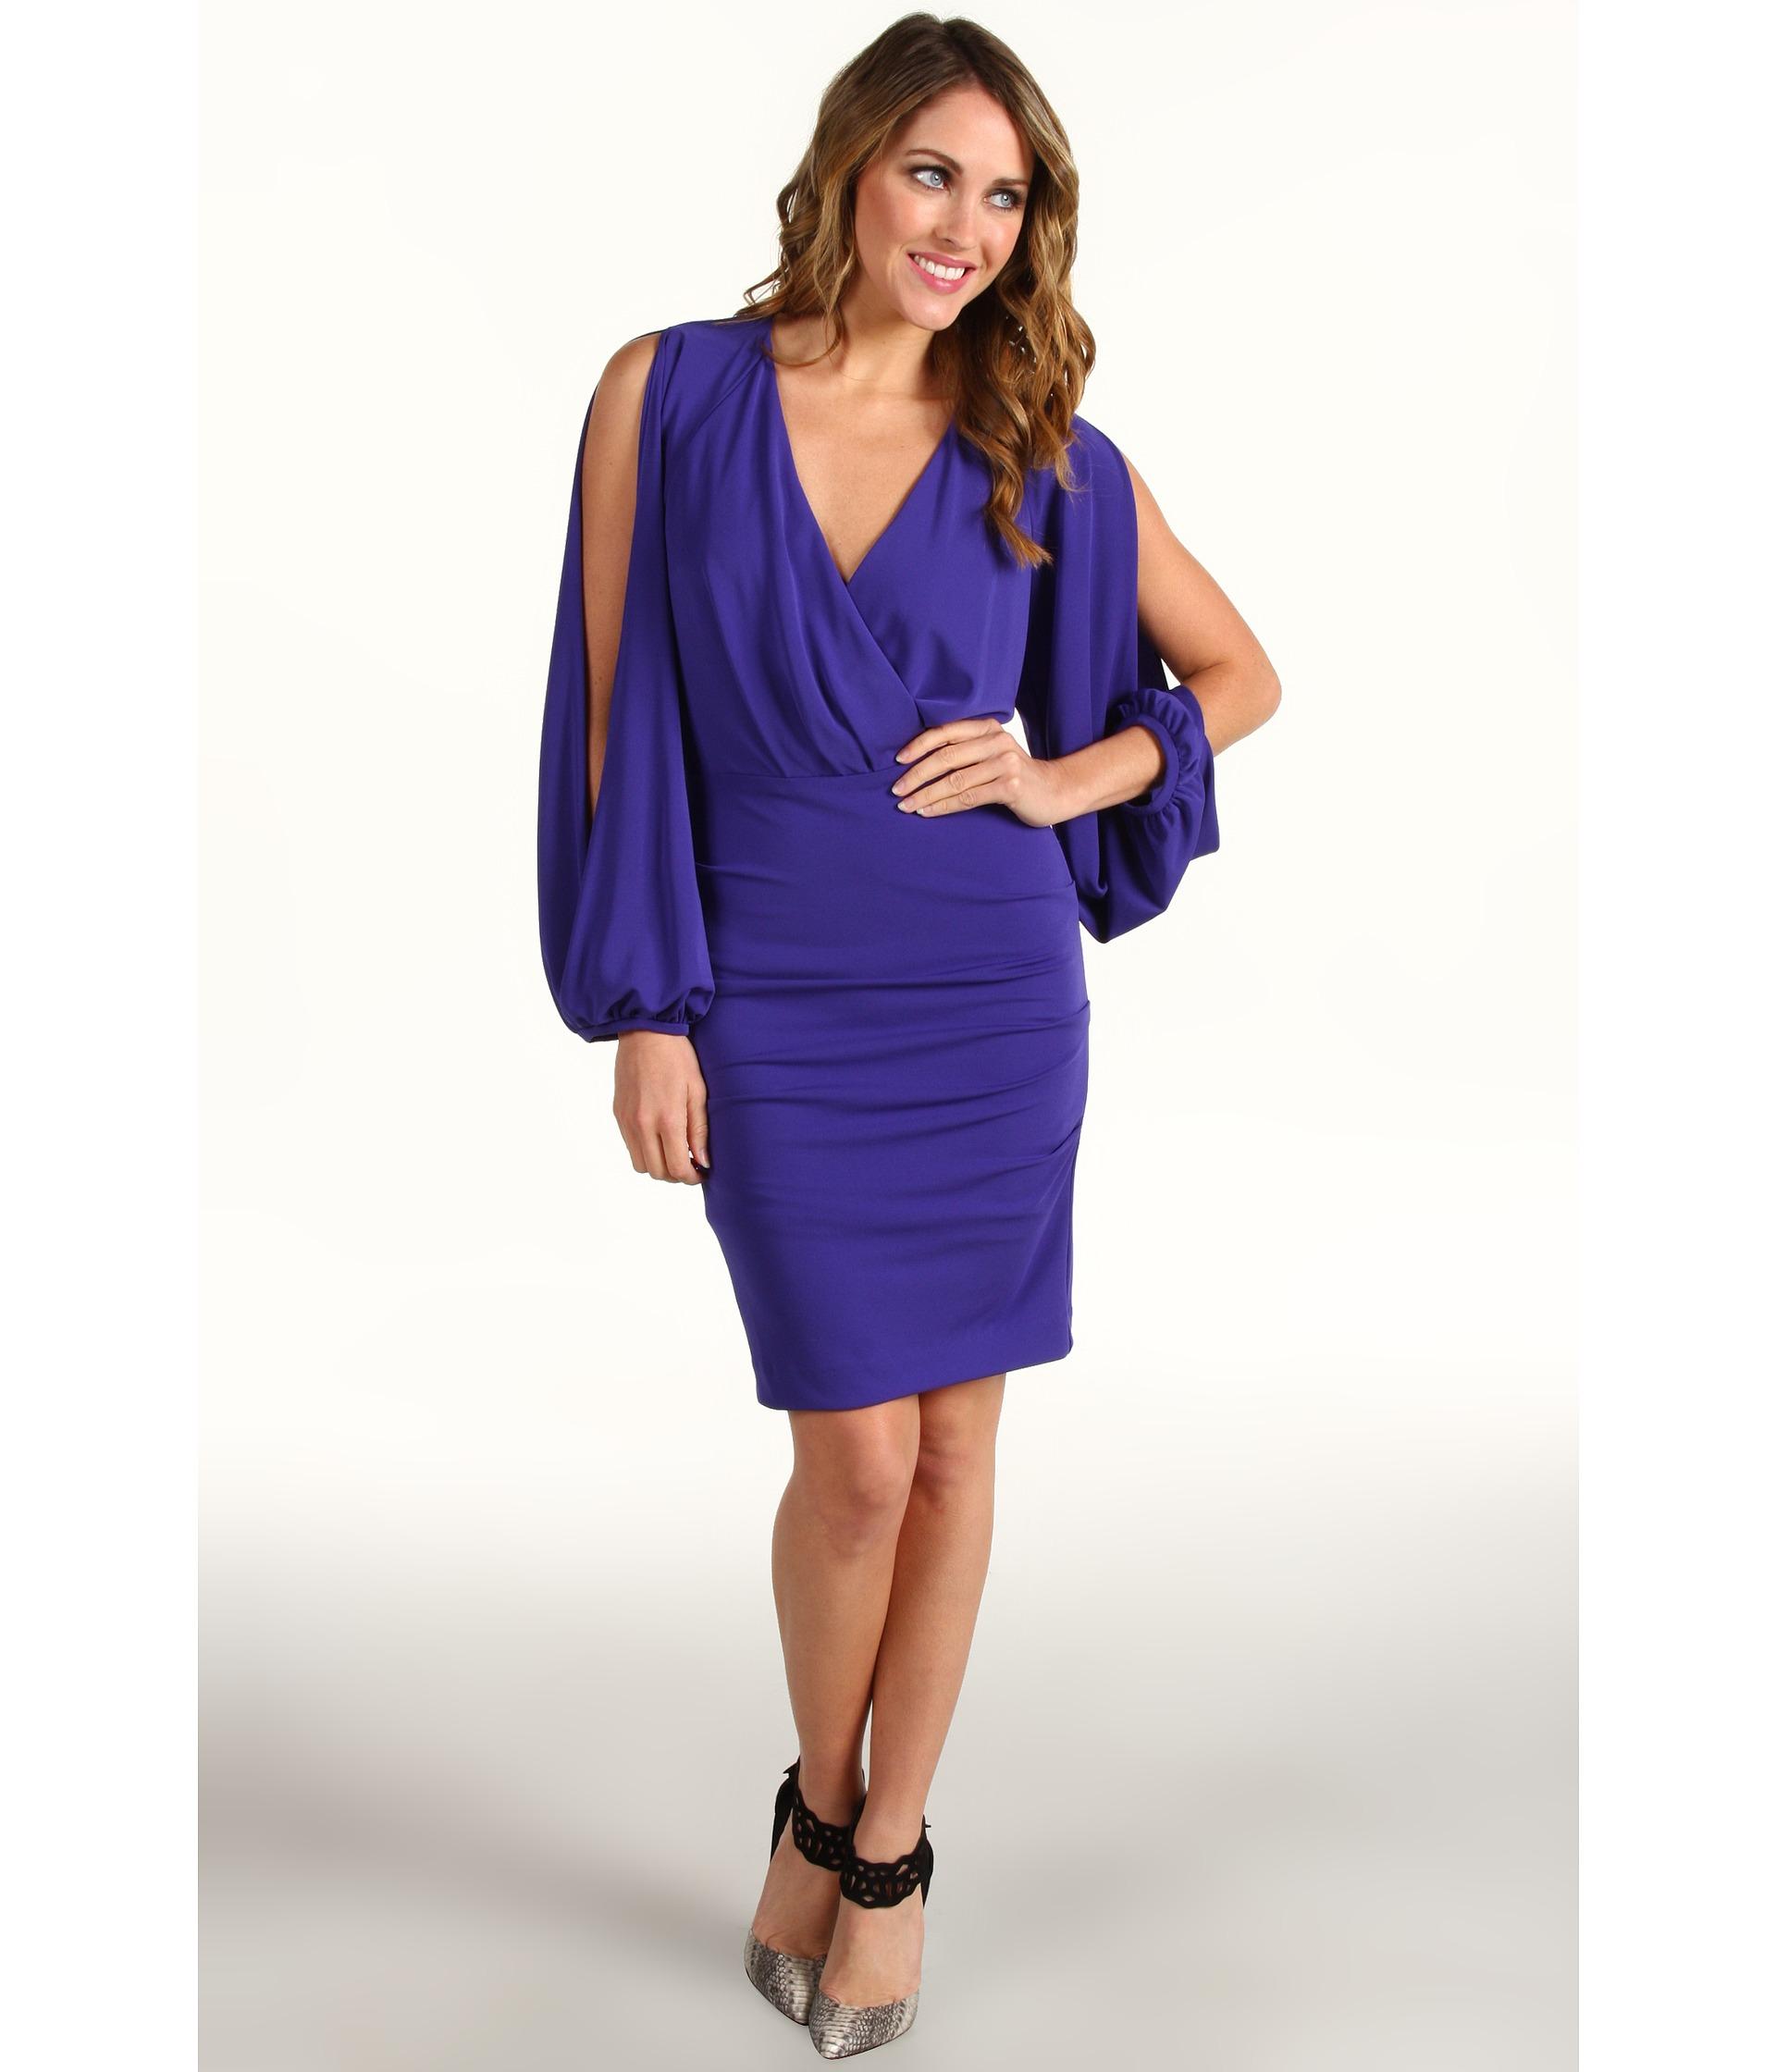 Nicole Miller Stretch Split Sleeve Dress $199.99 $355.00 SALE